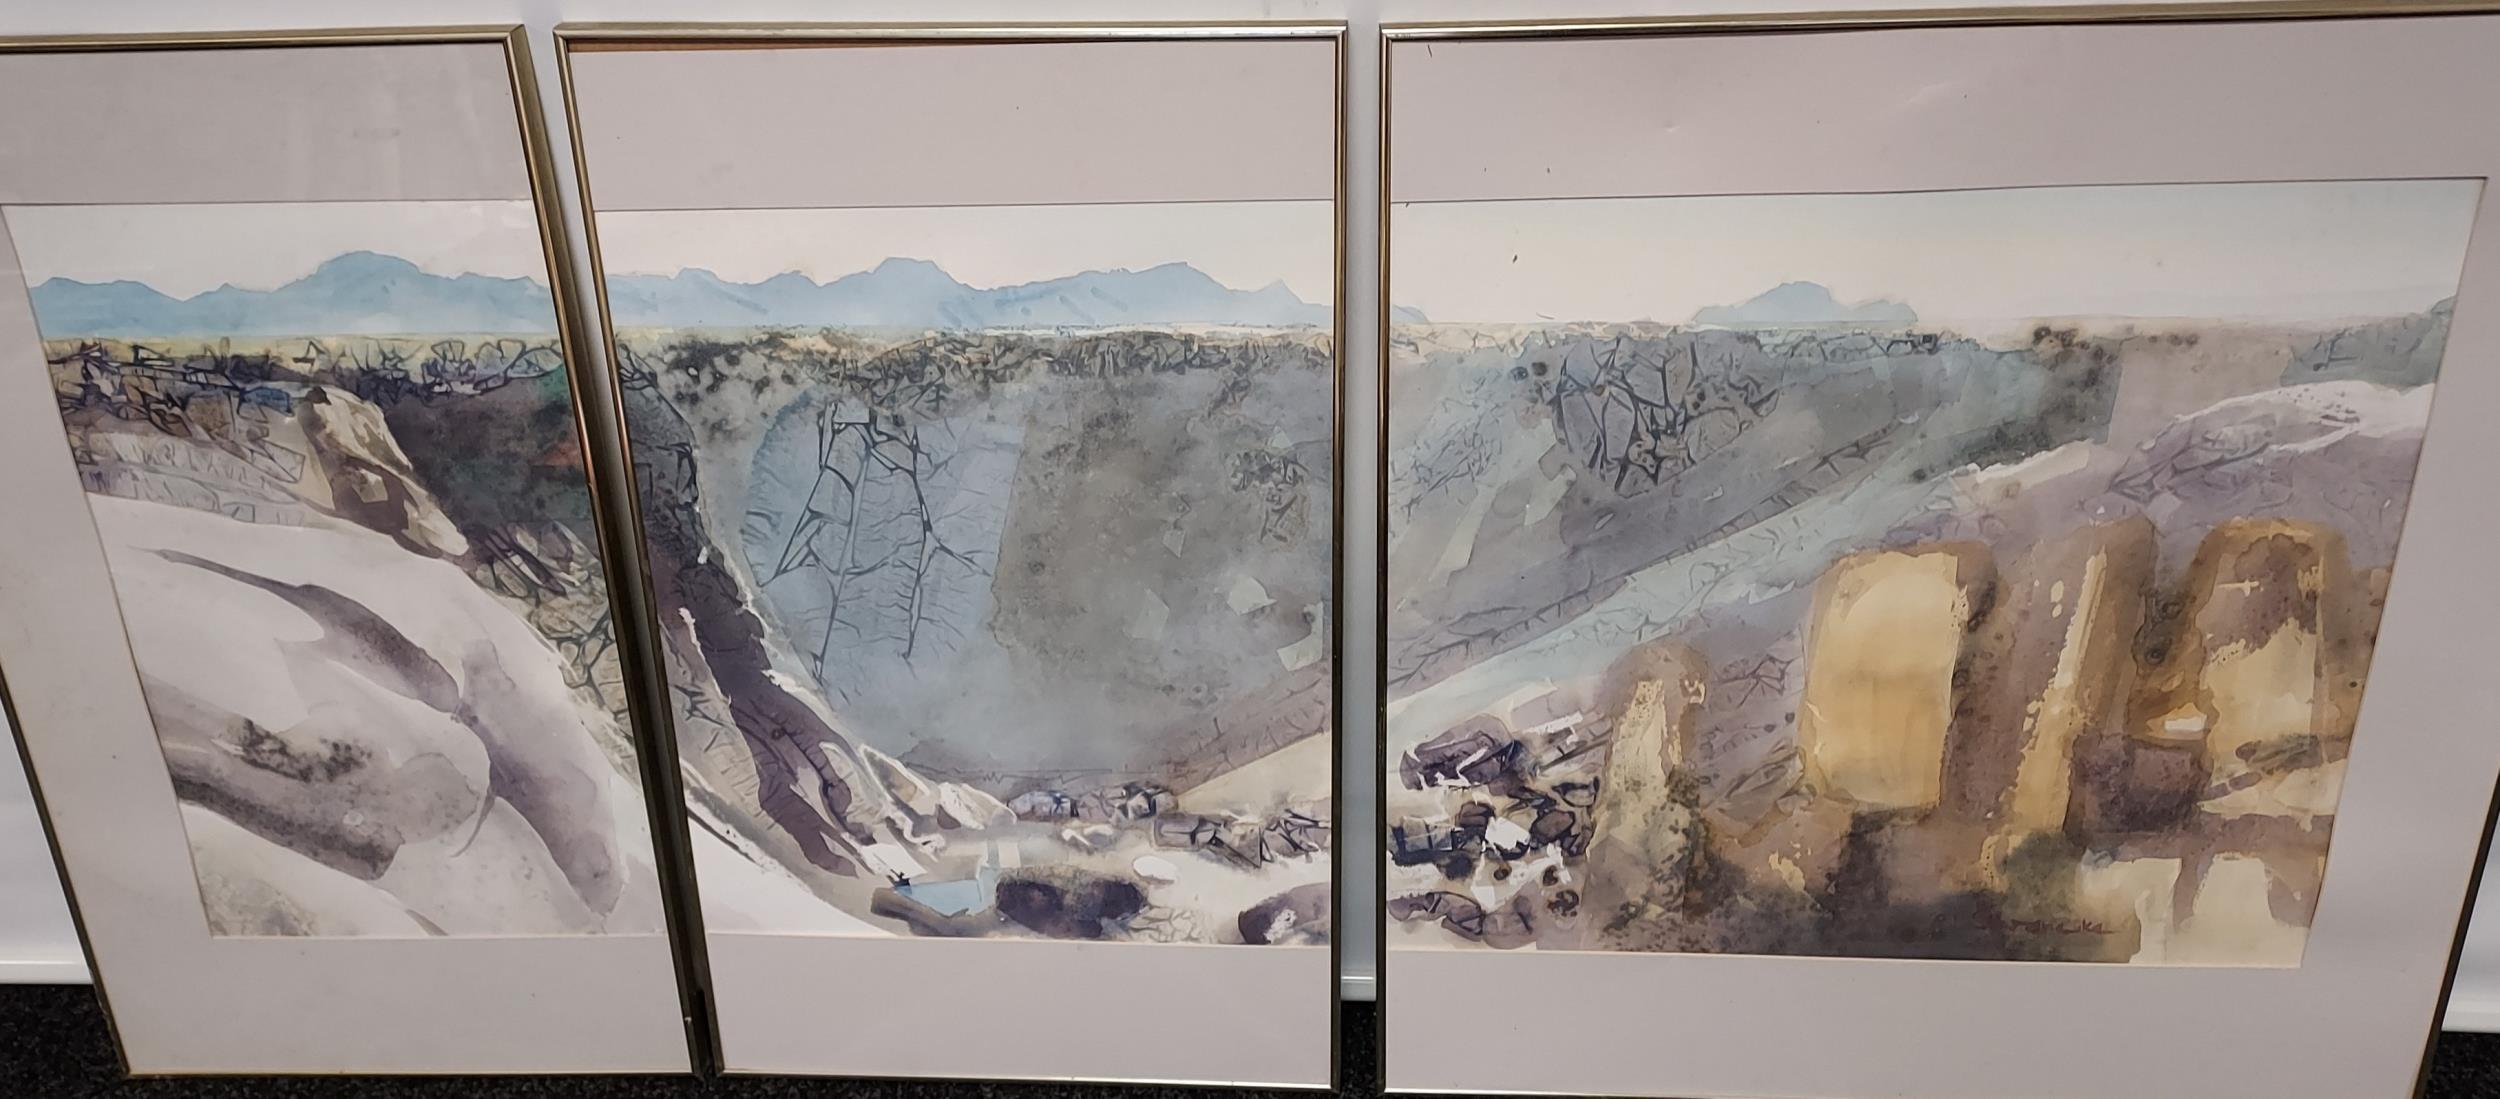 Ulrich Schwanecke [1932-2006] Original watercolour titled 'Augrabie Gorge [3 in 1]' exhibited in